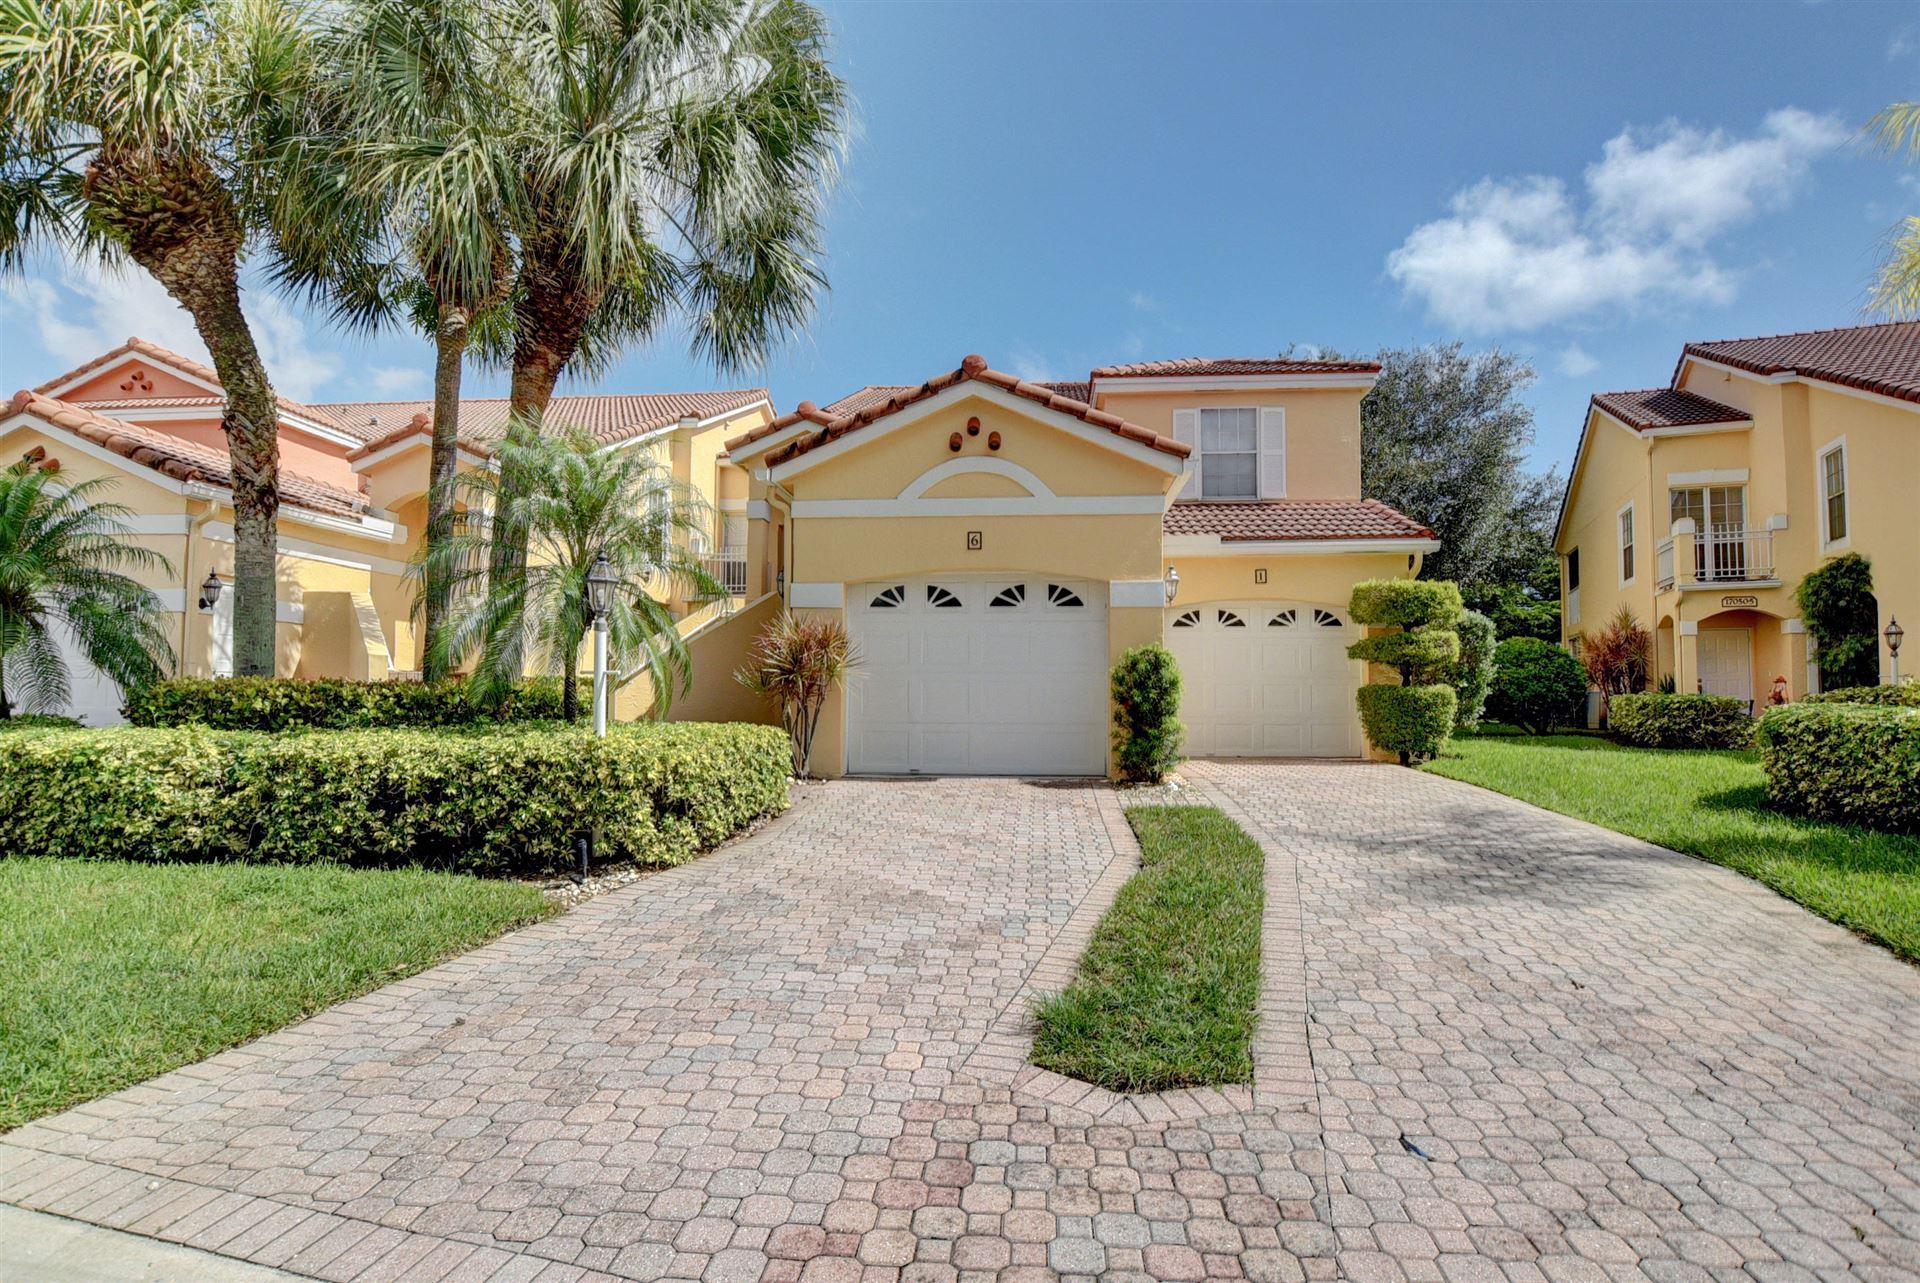 17060 Emile Street #6, Boca Raton, FL 33487 - #: RX-10666995